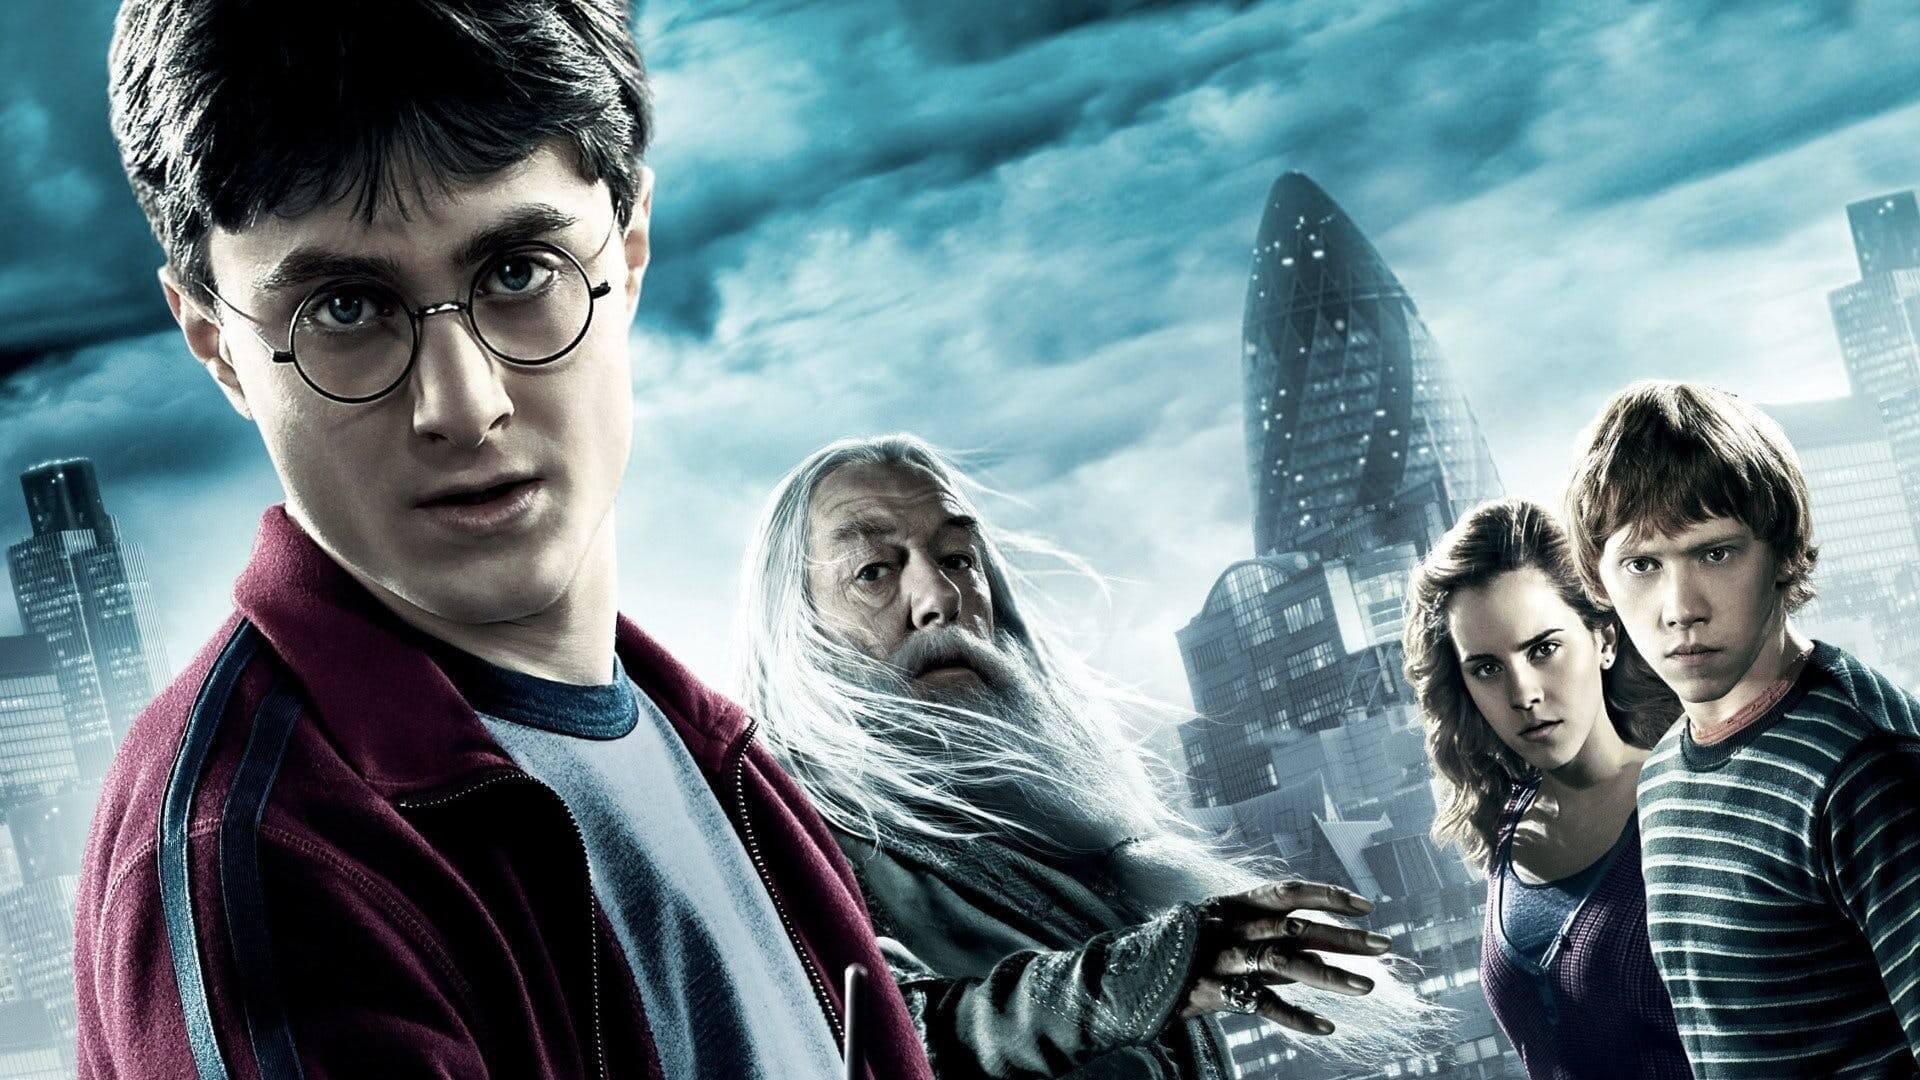 3000 Piece Harry Potter Jigsaw Available Soon